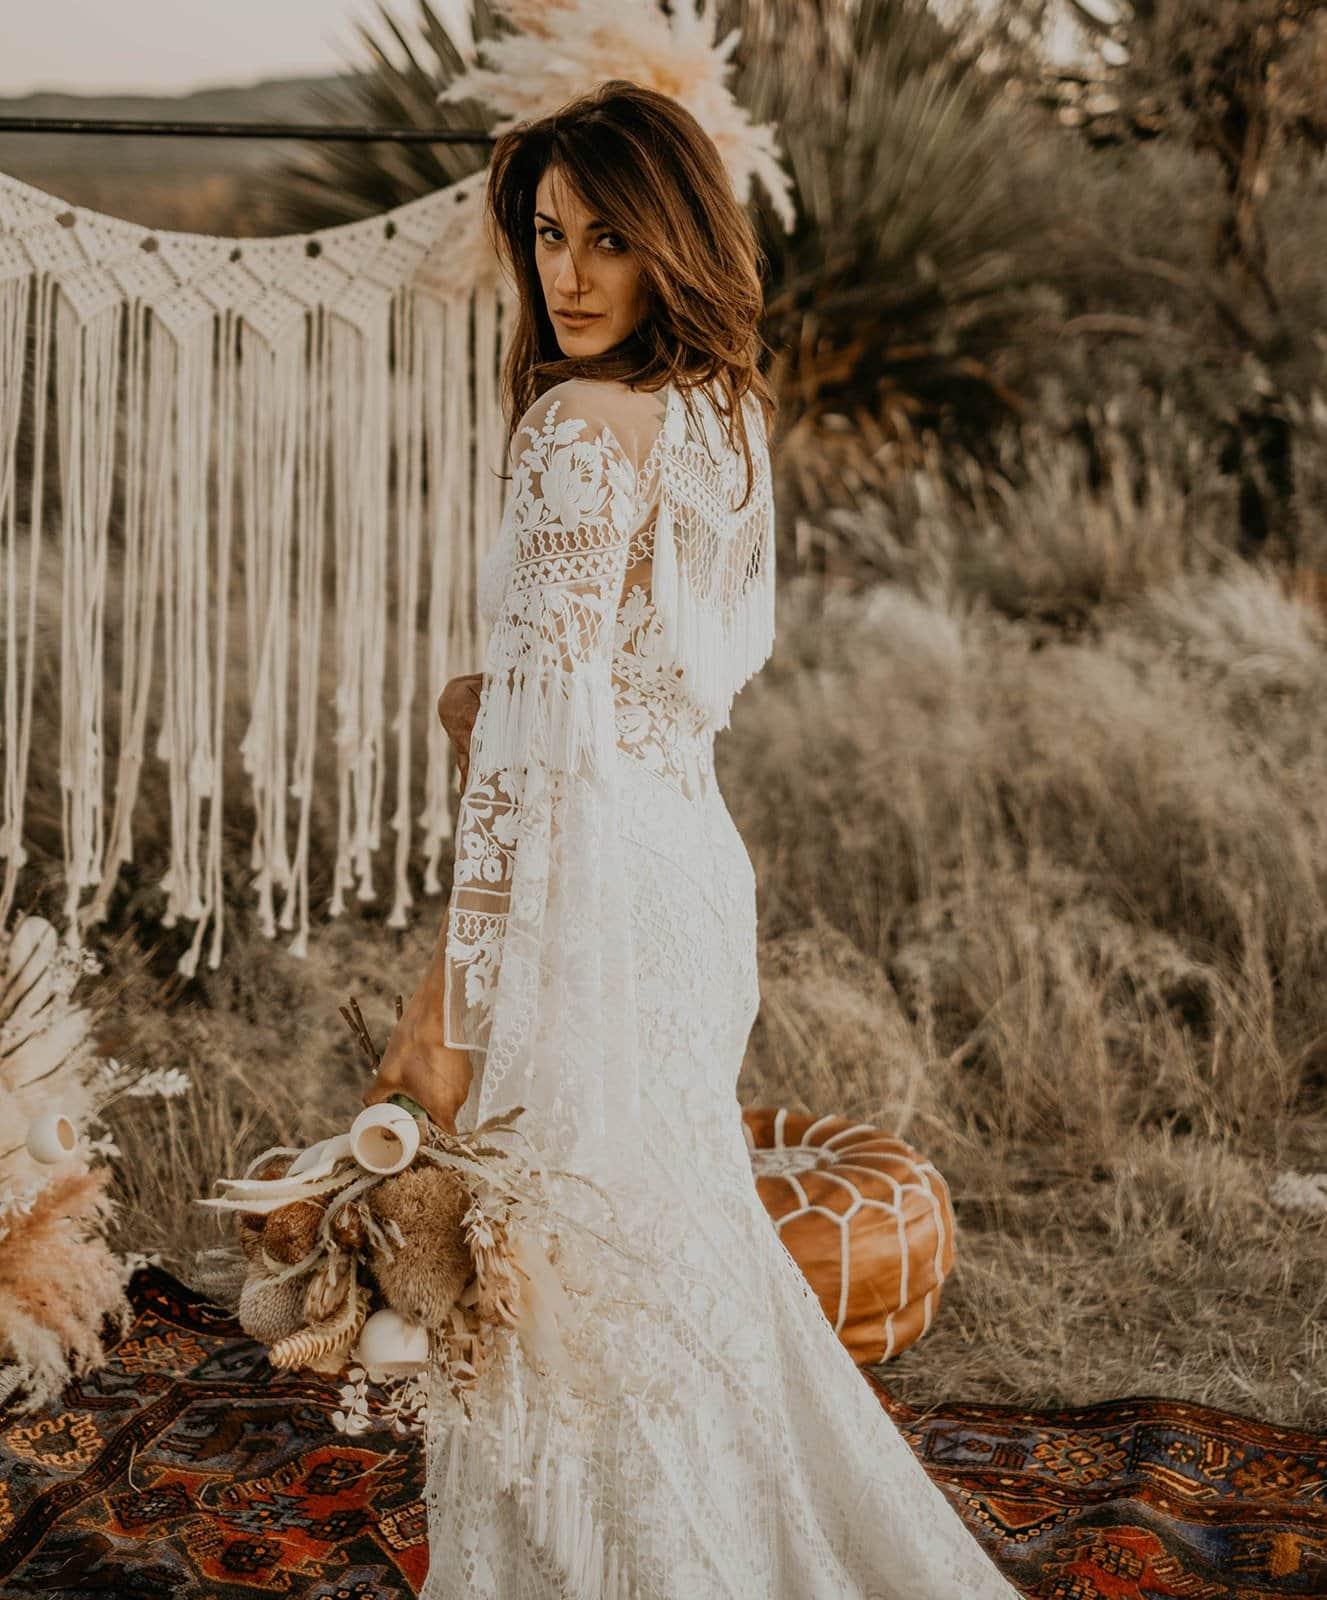 A&Be Bridal dress in boho wedding shoot.